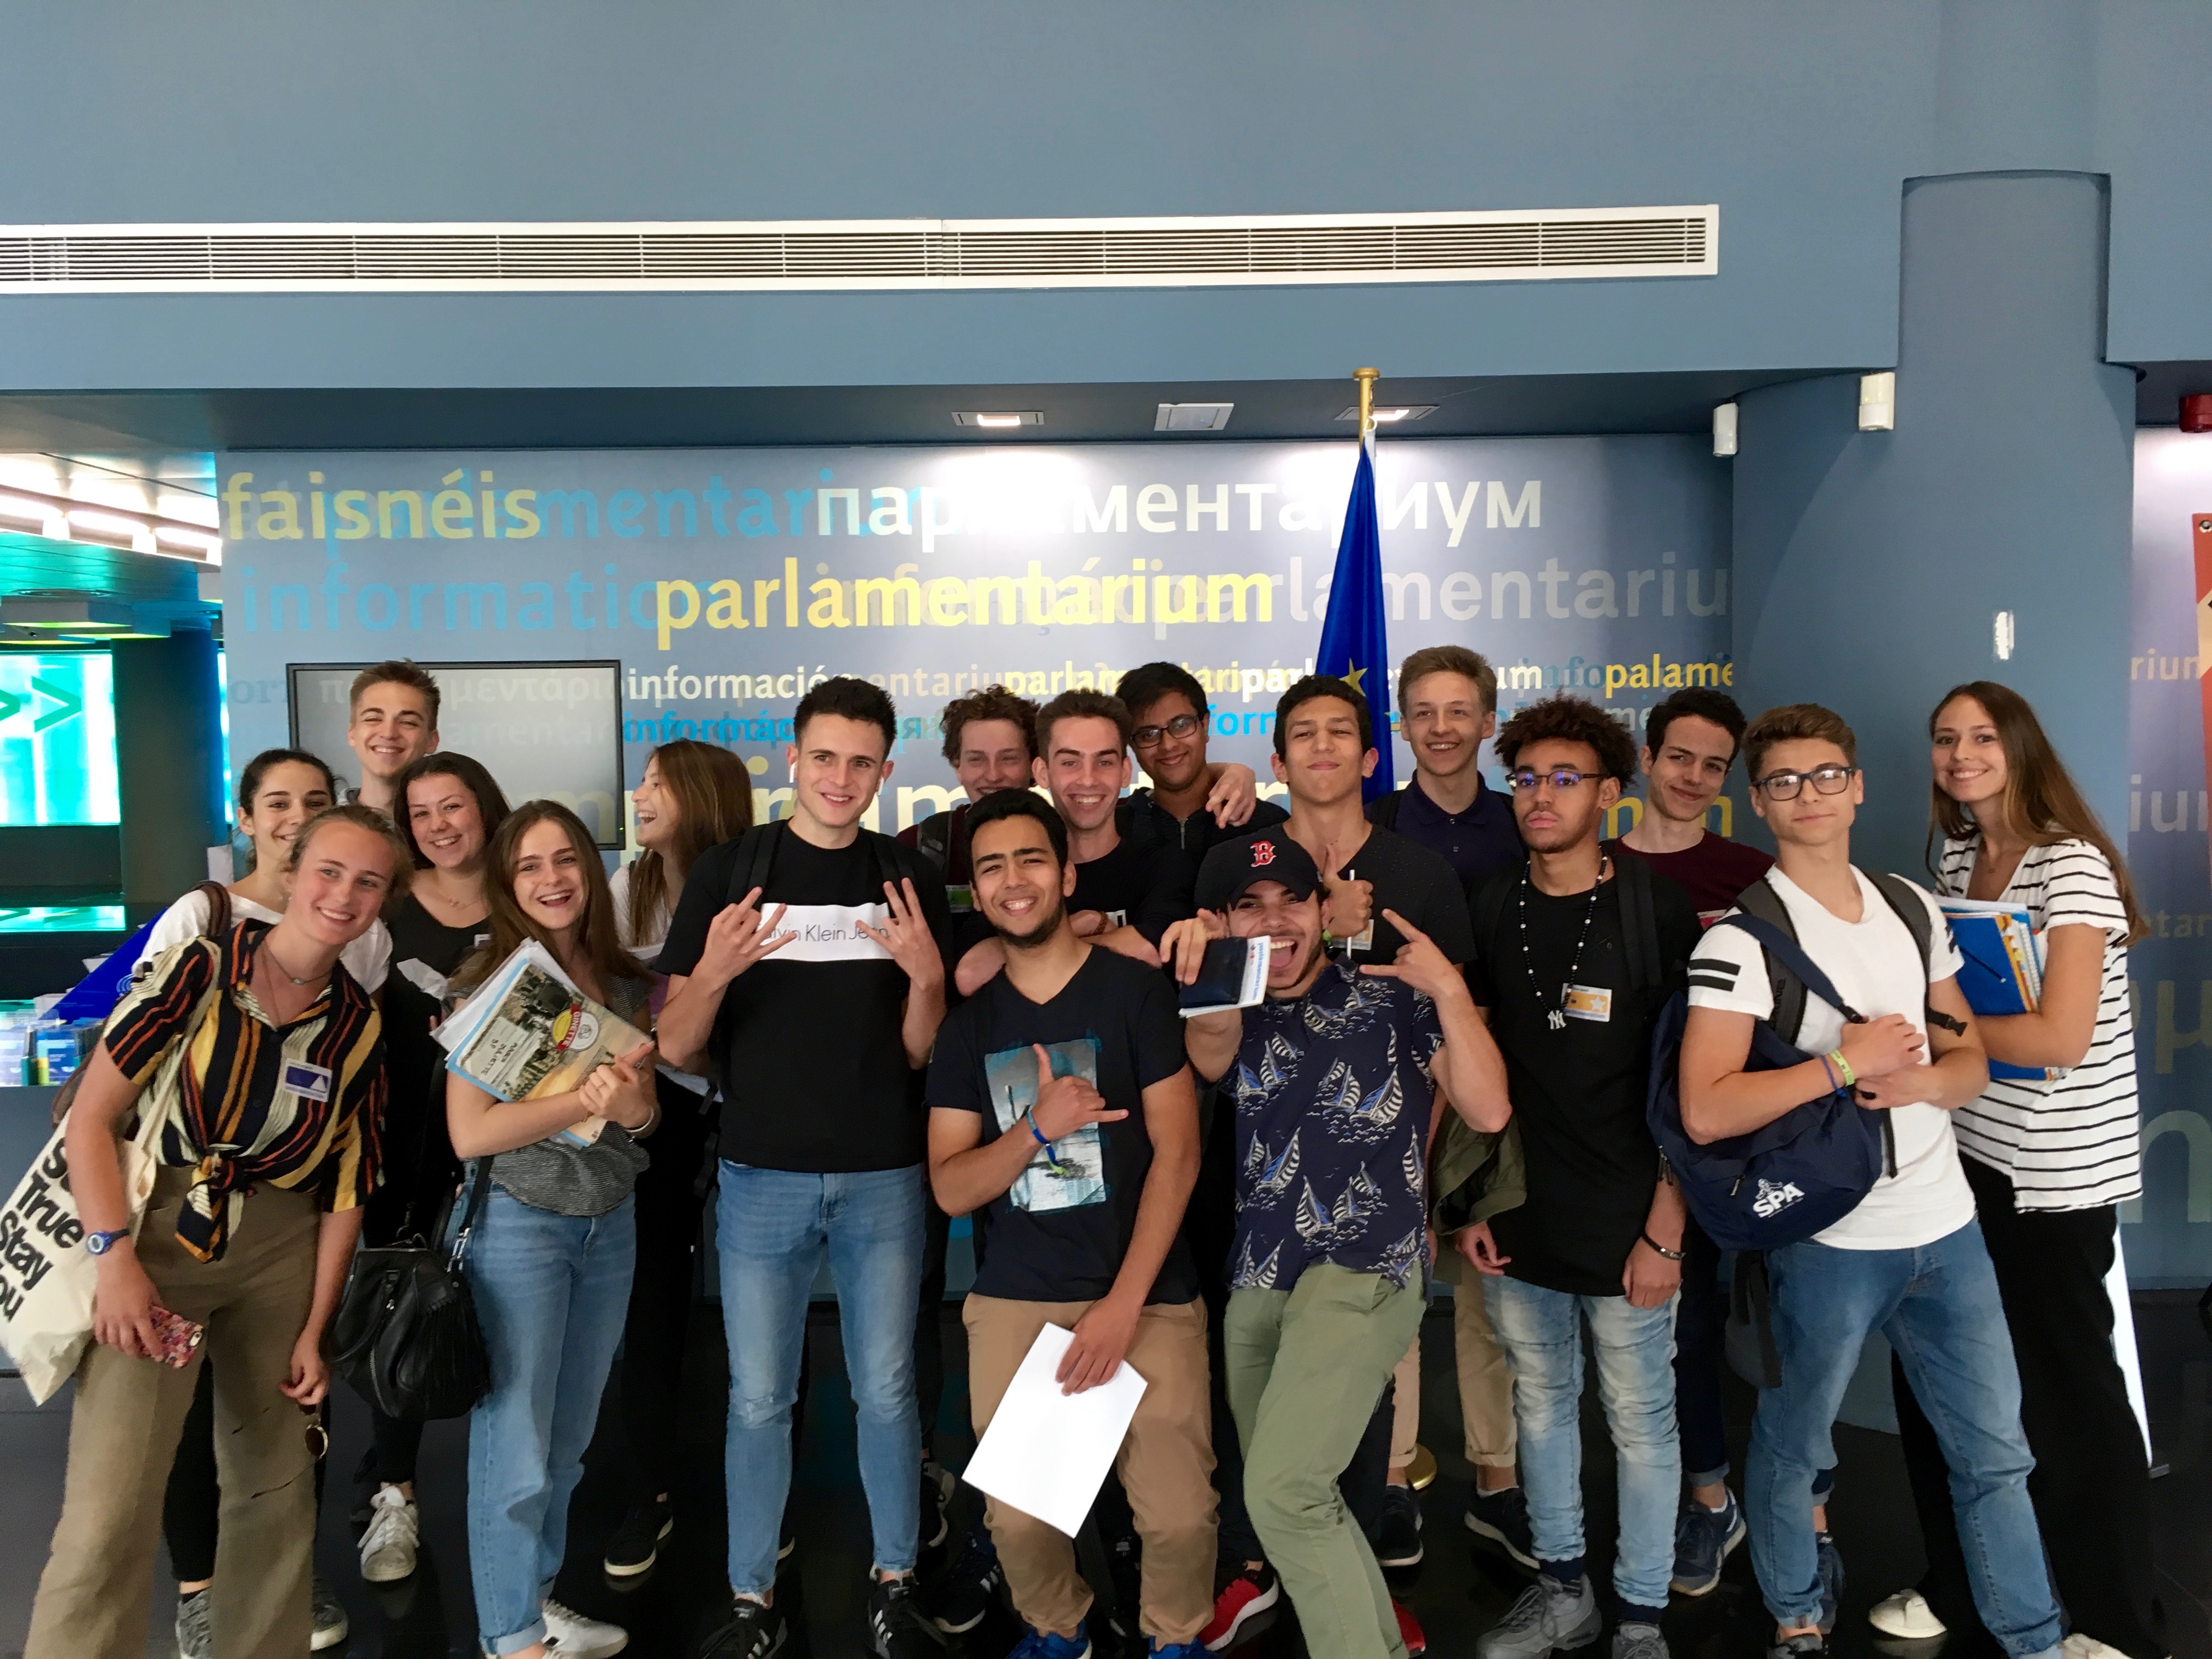 Annexe Parlamentarium2018_NDC_XVW.jpg